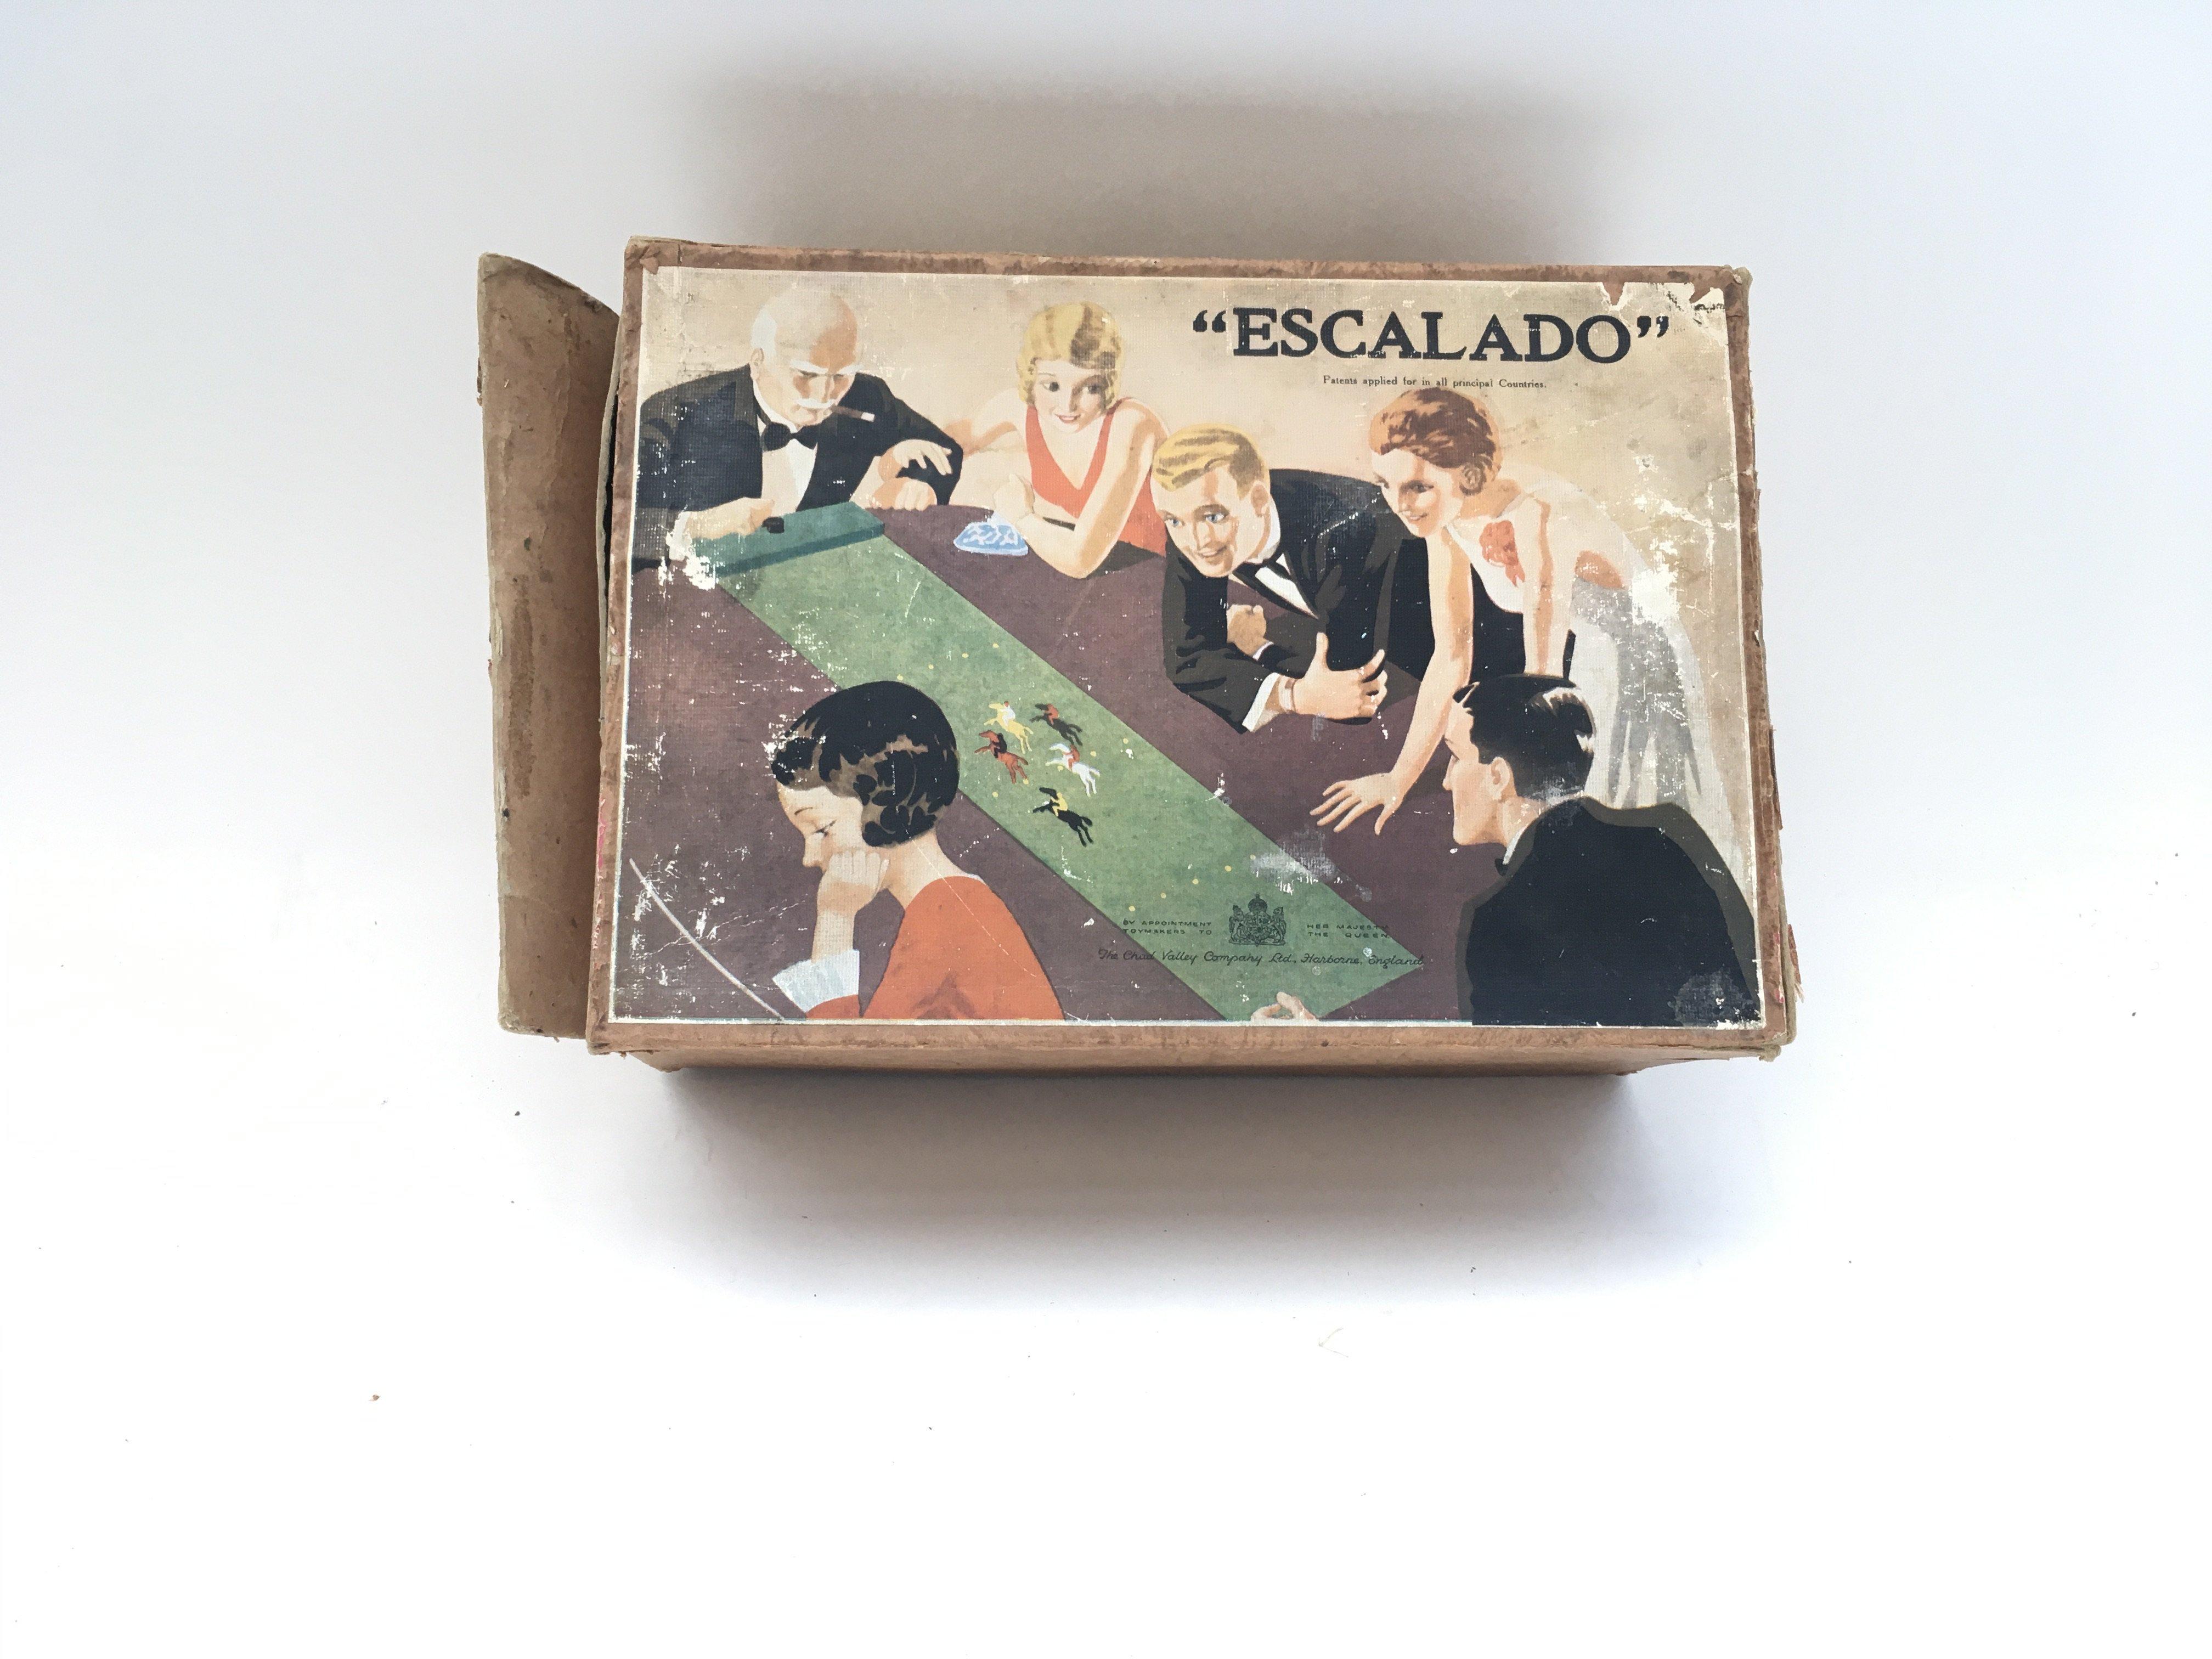 Antique Chad valley Escalado vintage horse racing game. 1930's image cover.